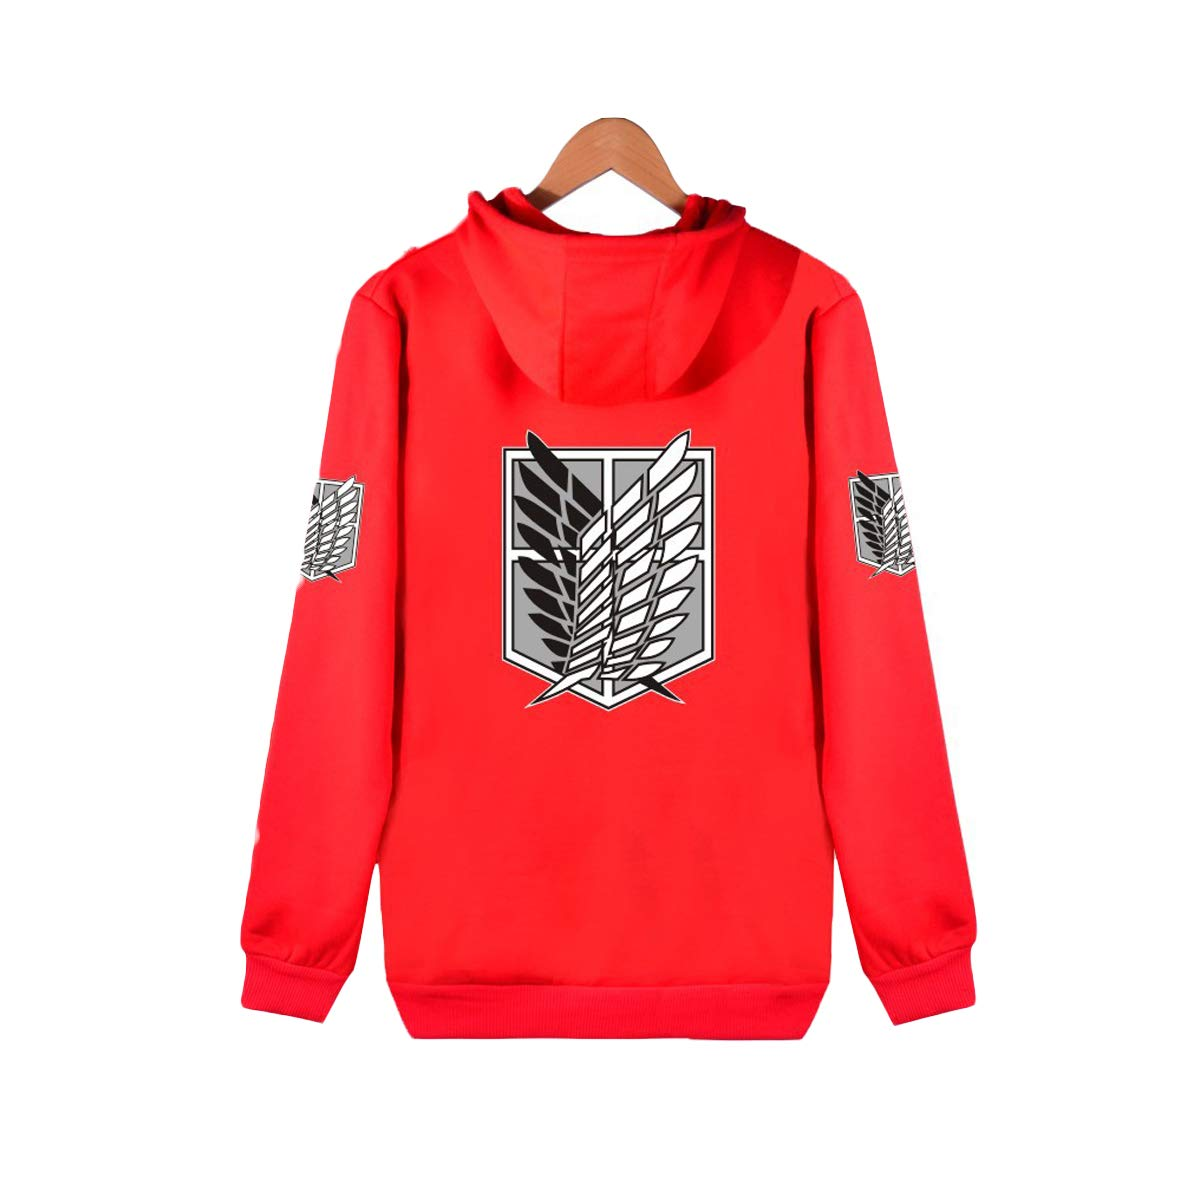 Fmeijia Unisex Sweatshirt Hoodies Autumn Winter Casual Loose Oullover Sweatshirt Hoodie Tops